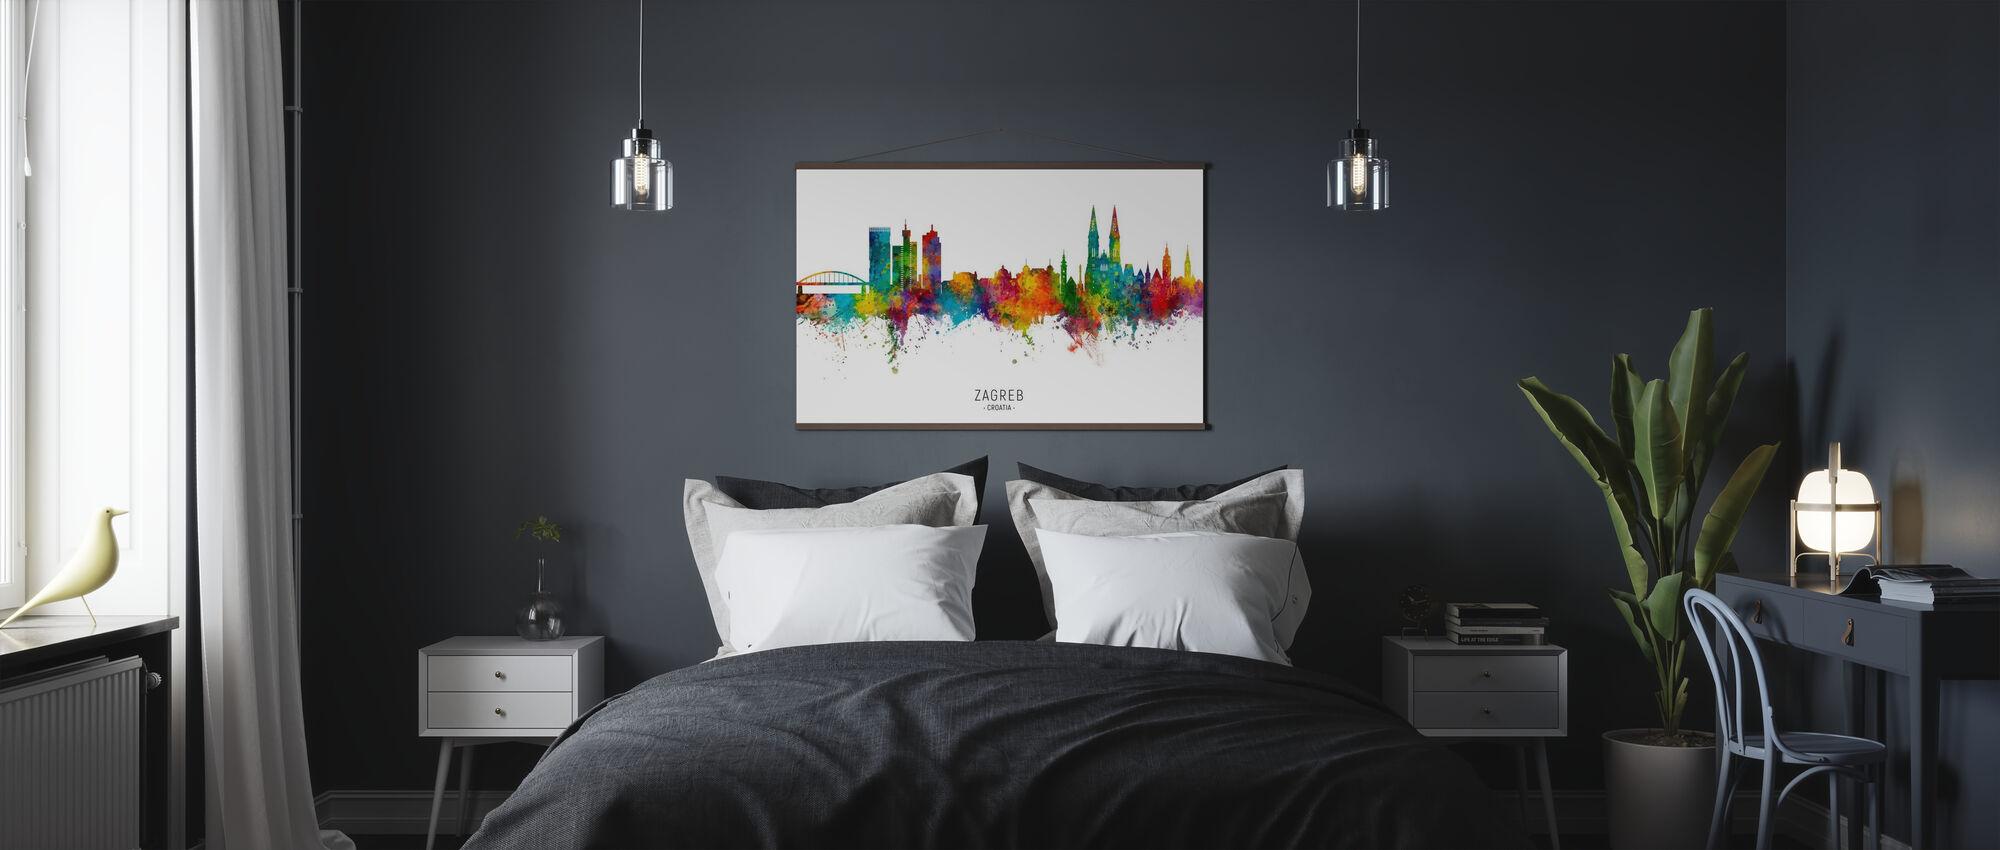 Zagreb Croatia Skyline - Poster - Bedroom